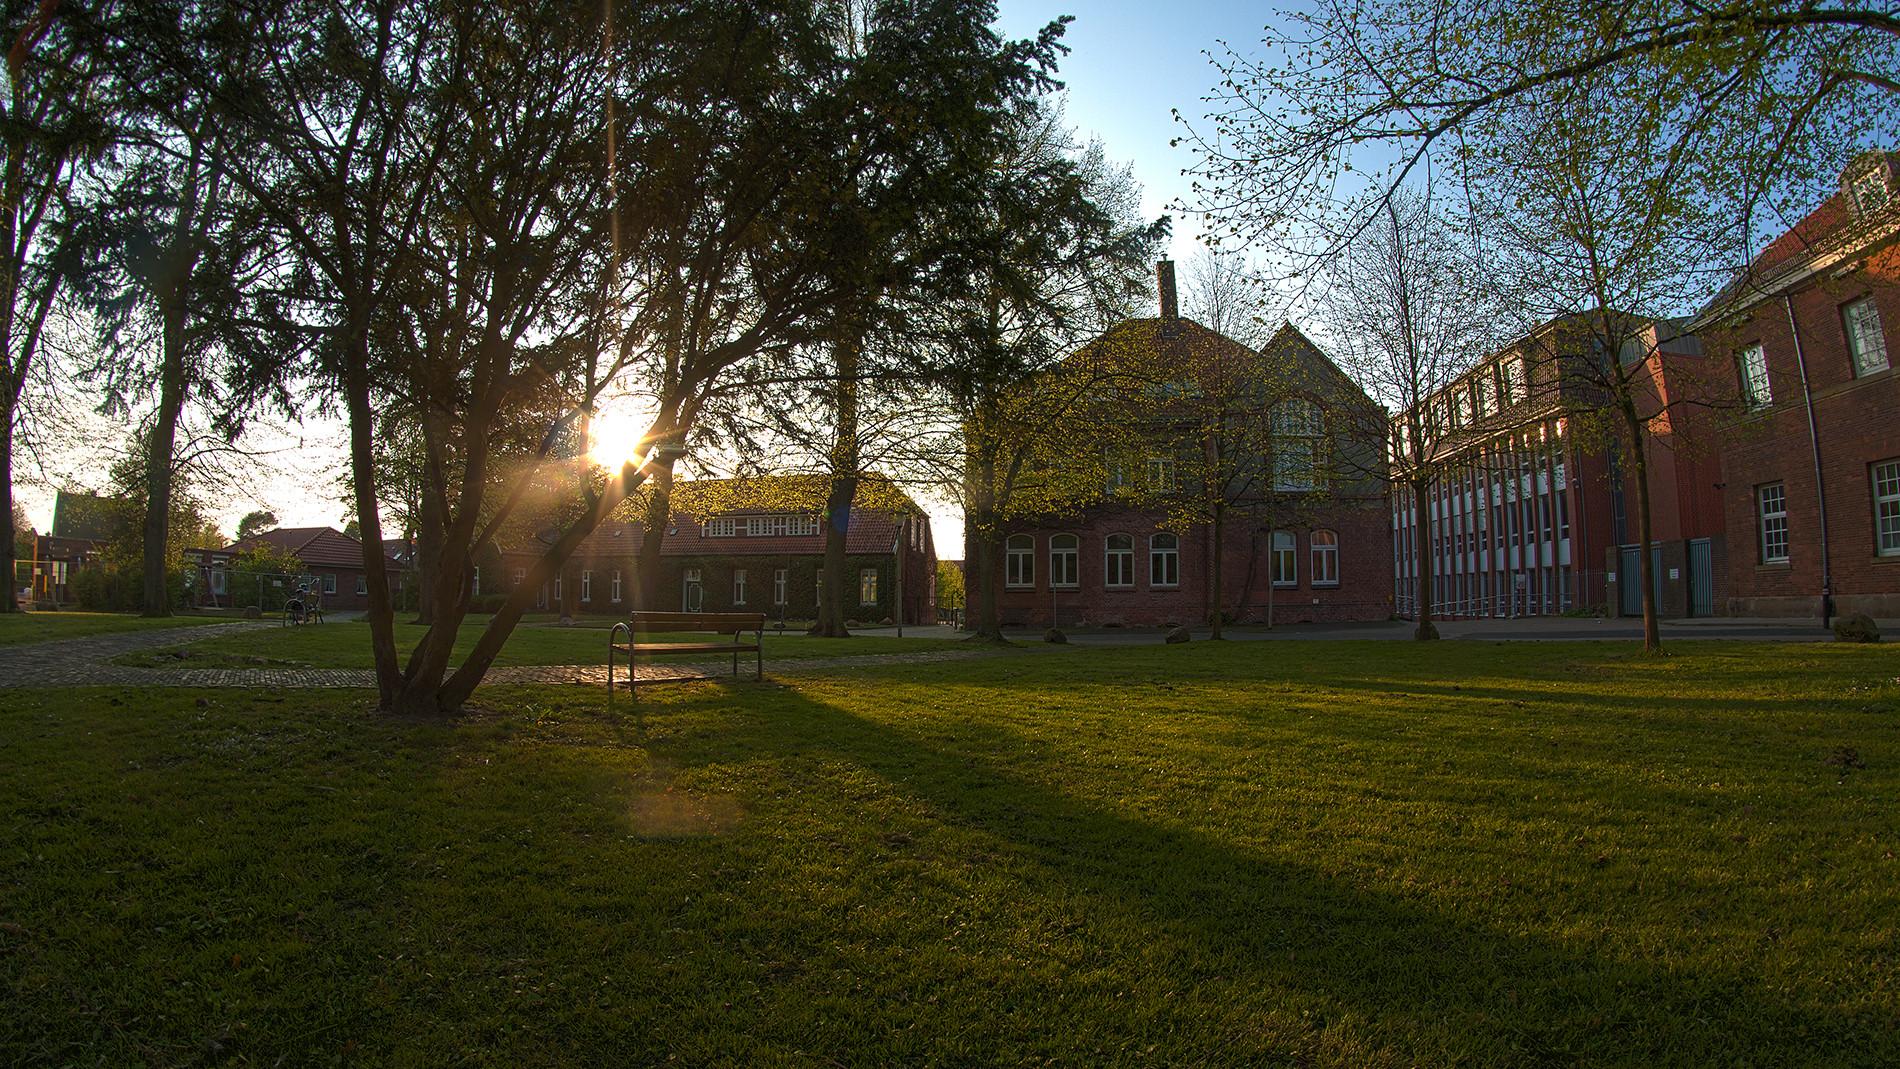 Fräuleinshof, Norden